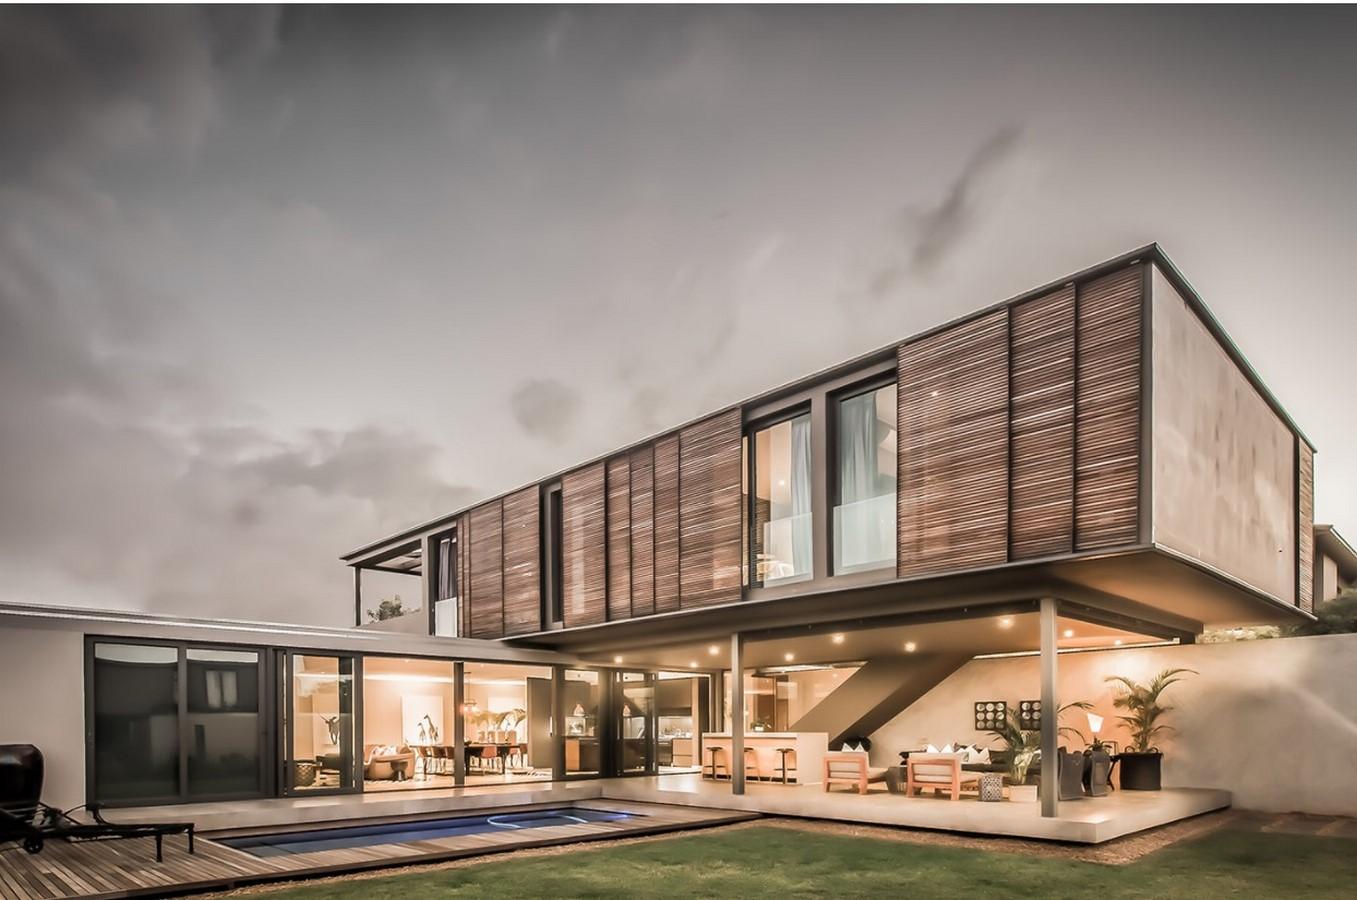 Umhlanga House 1 - Sheet1